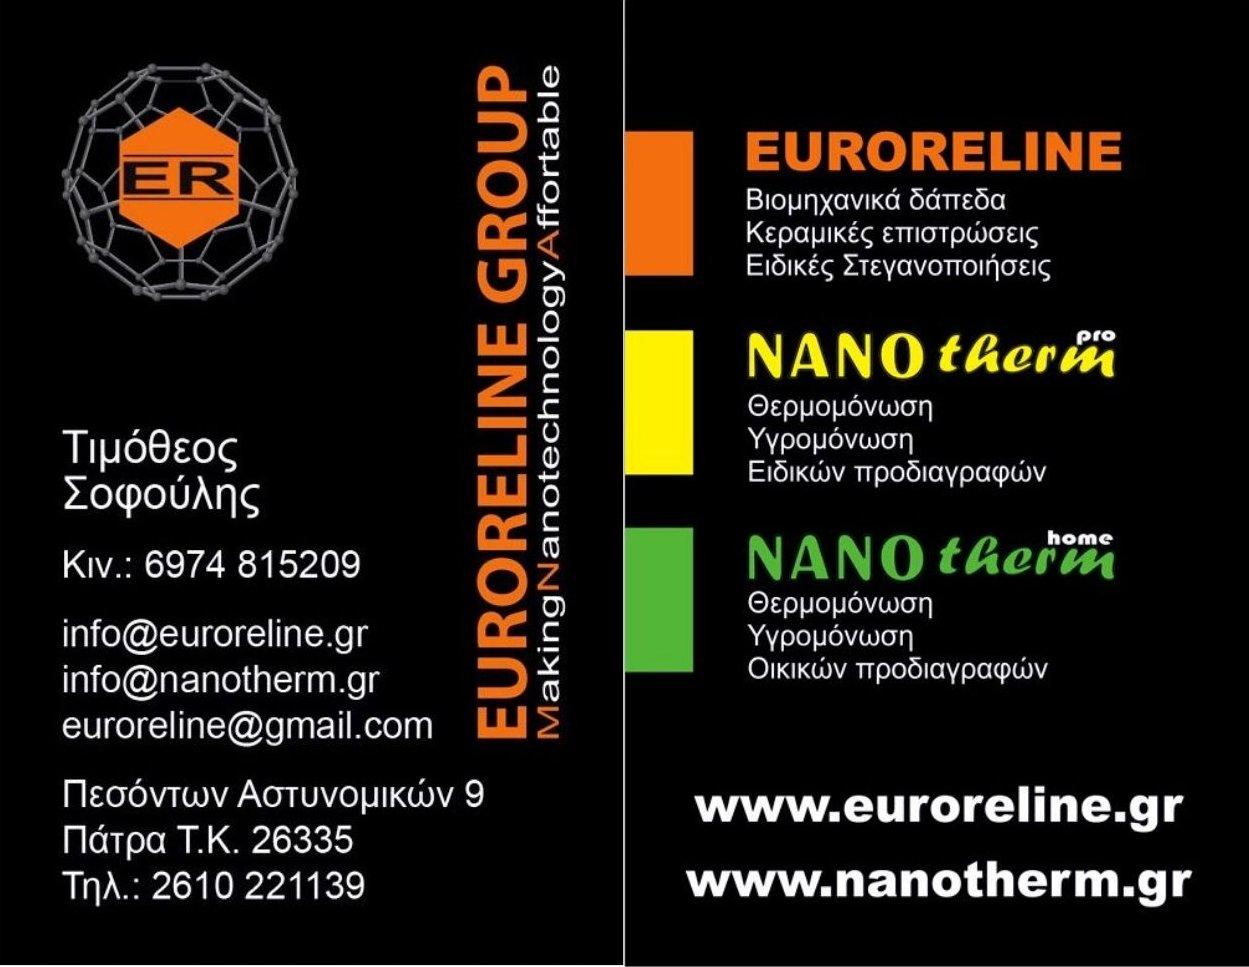 euroreline